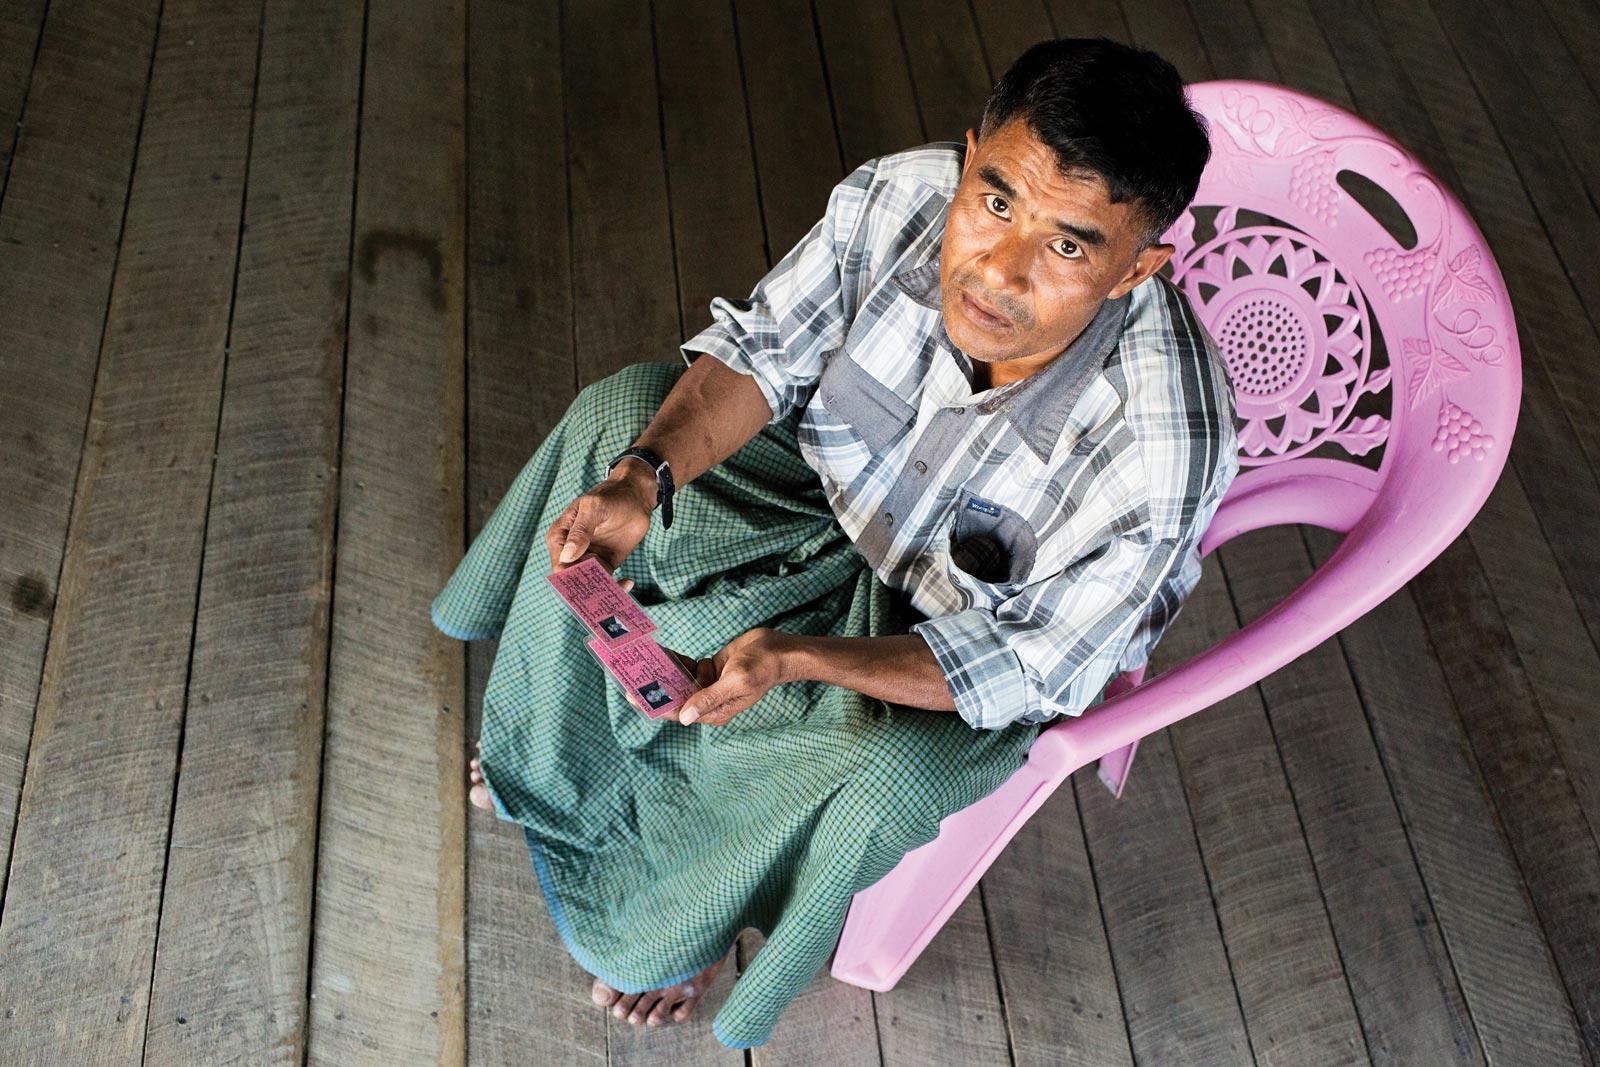 Maung Zaw, an ethnic Kaman who was branded a 'Bengali' on receiving citizenship in 2014. Photo: Antolín Avezuela Aristu